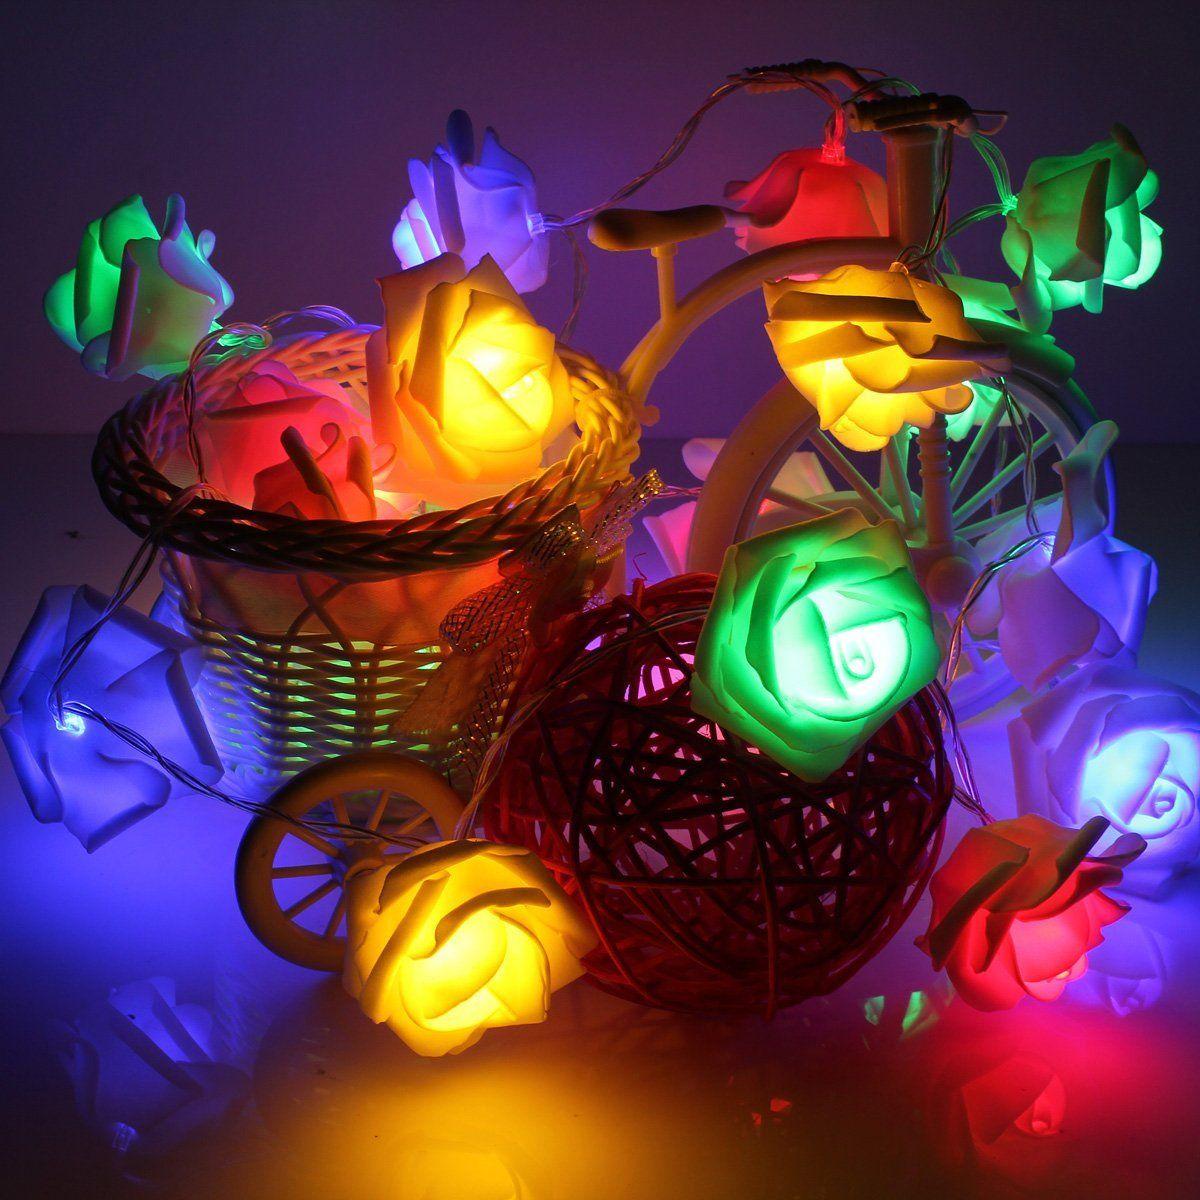 20 LED AA Battery Operated Rose Flower String Light Wedding Garden Christmas Home Party Decor Pink/White/Blue/Green/Purple/White Led Strings